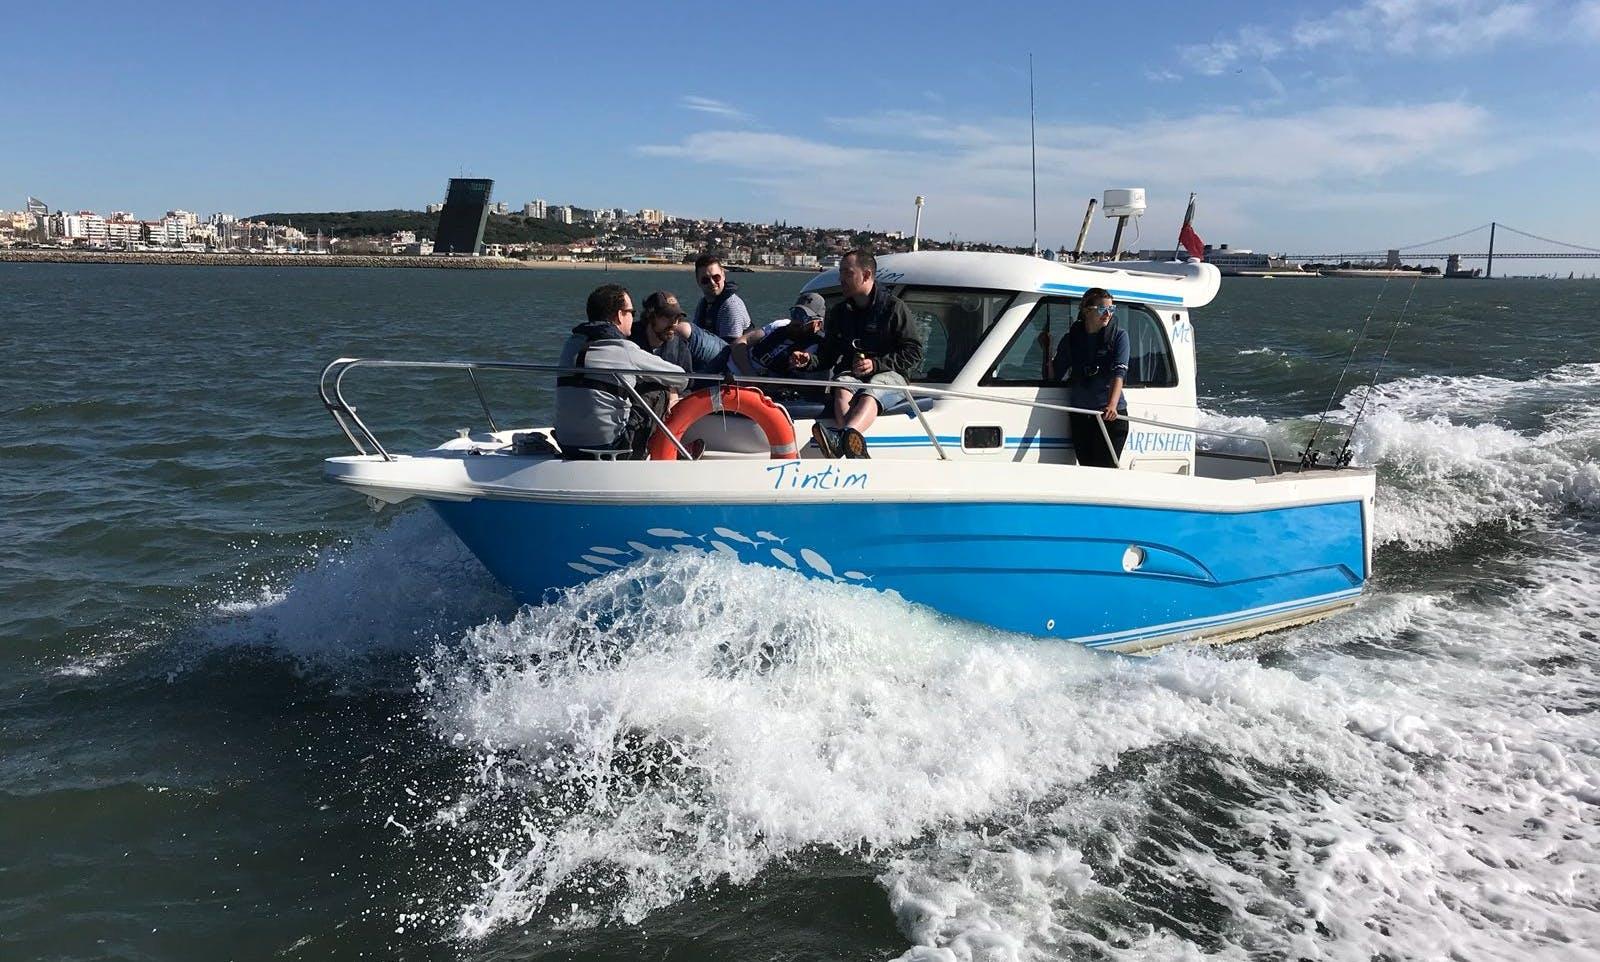 TINTIM FISHING TRIPS w/ BBQ & Transfers in Lisbon, Portugal